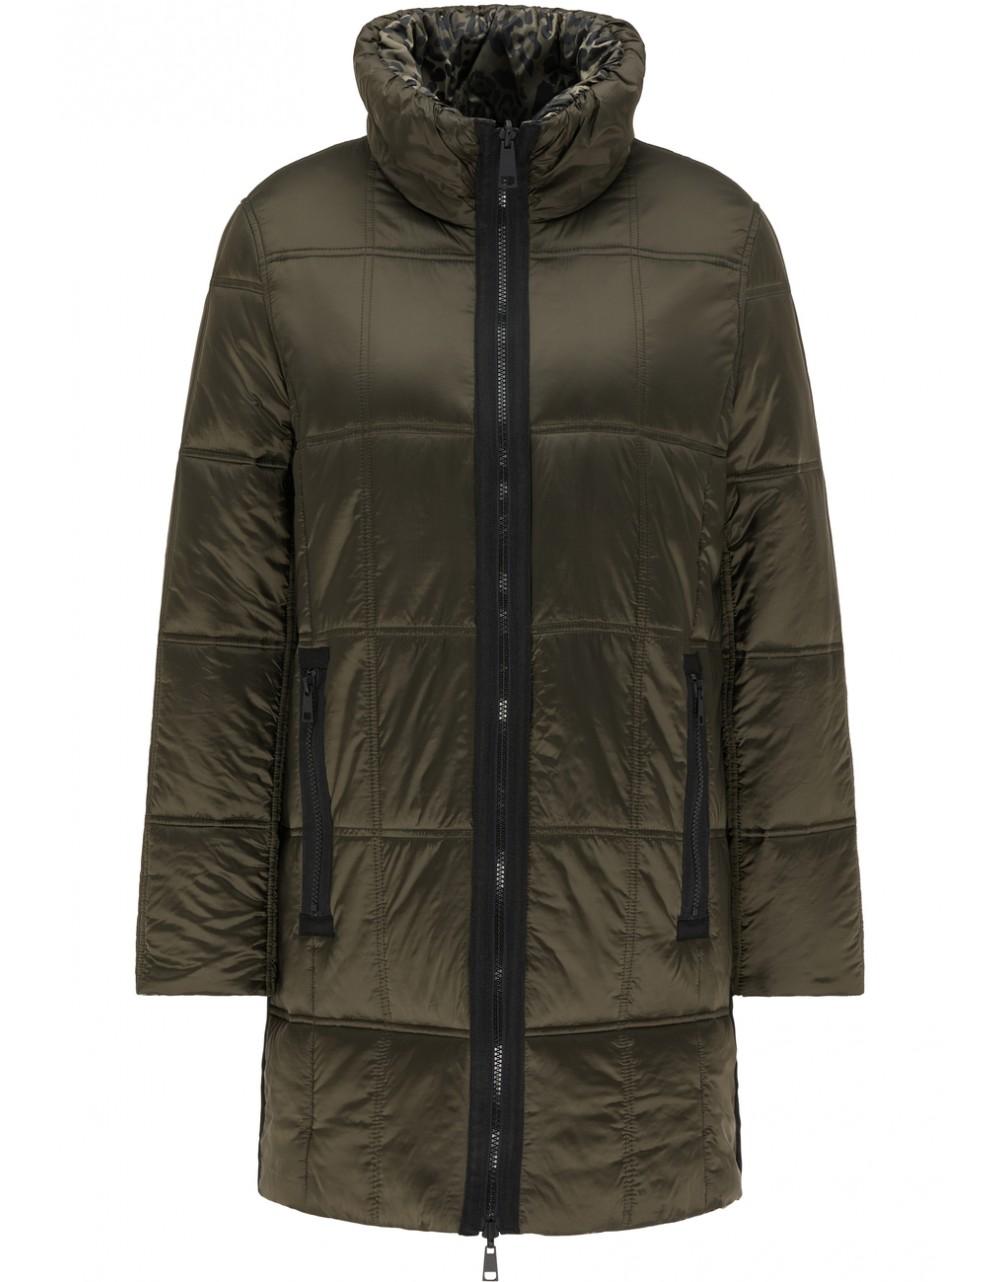 Lebek Reversible Long Quilted Jacket|Lebek Outerwear|Irish Handcrafts 1